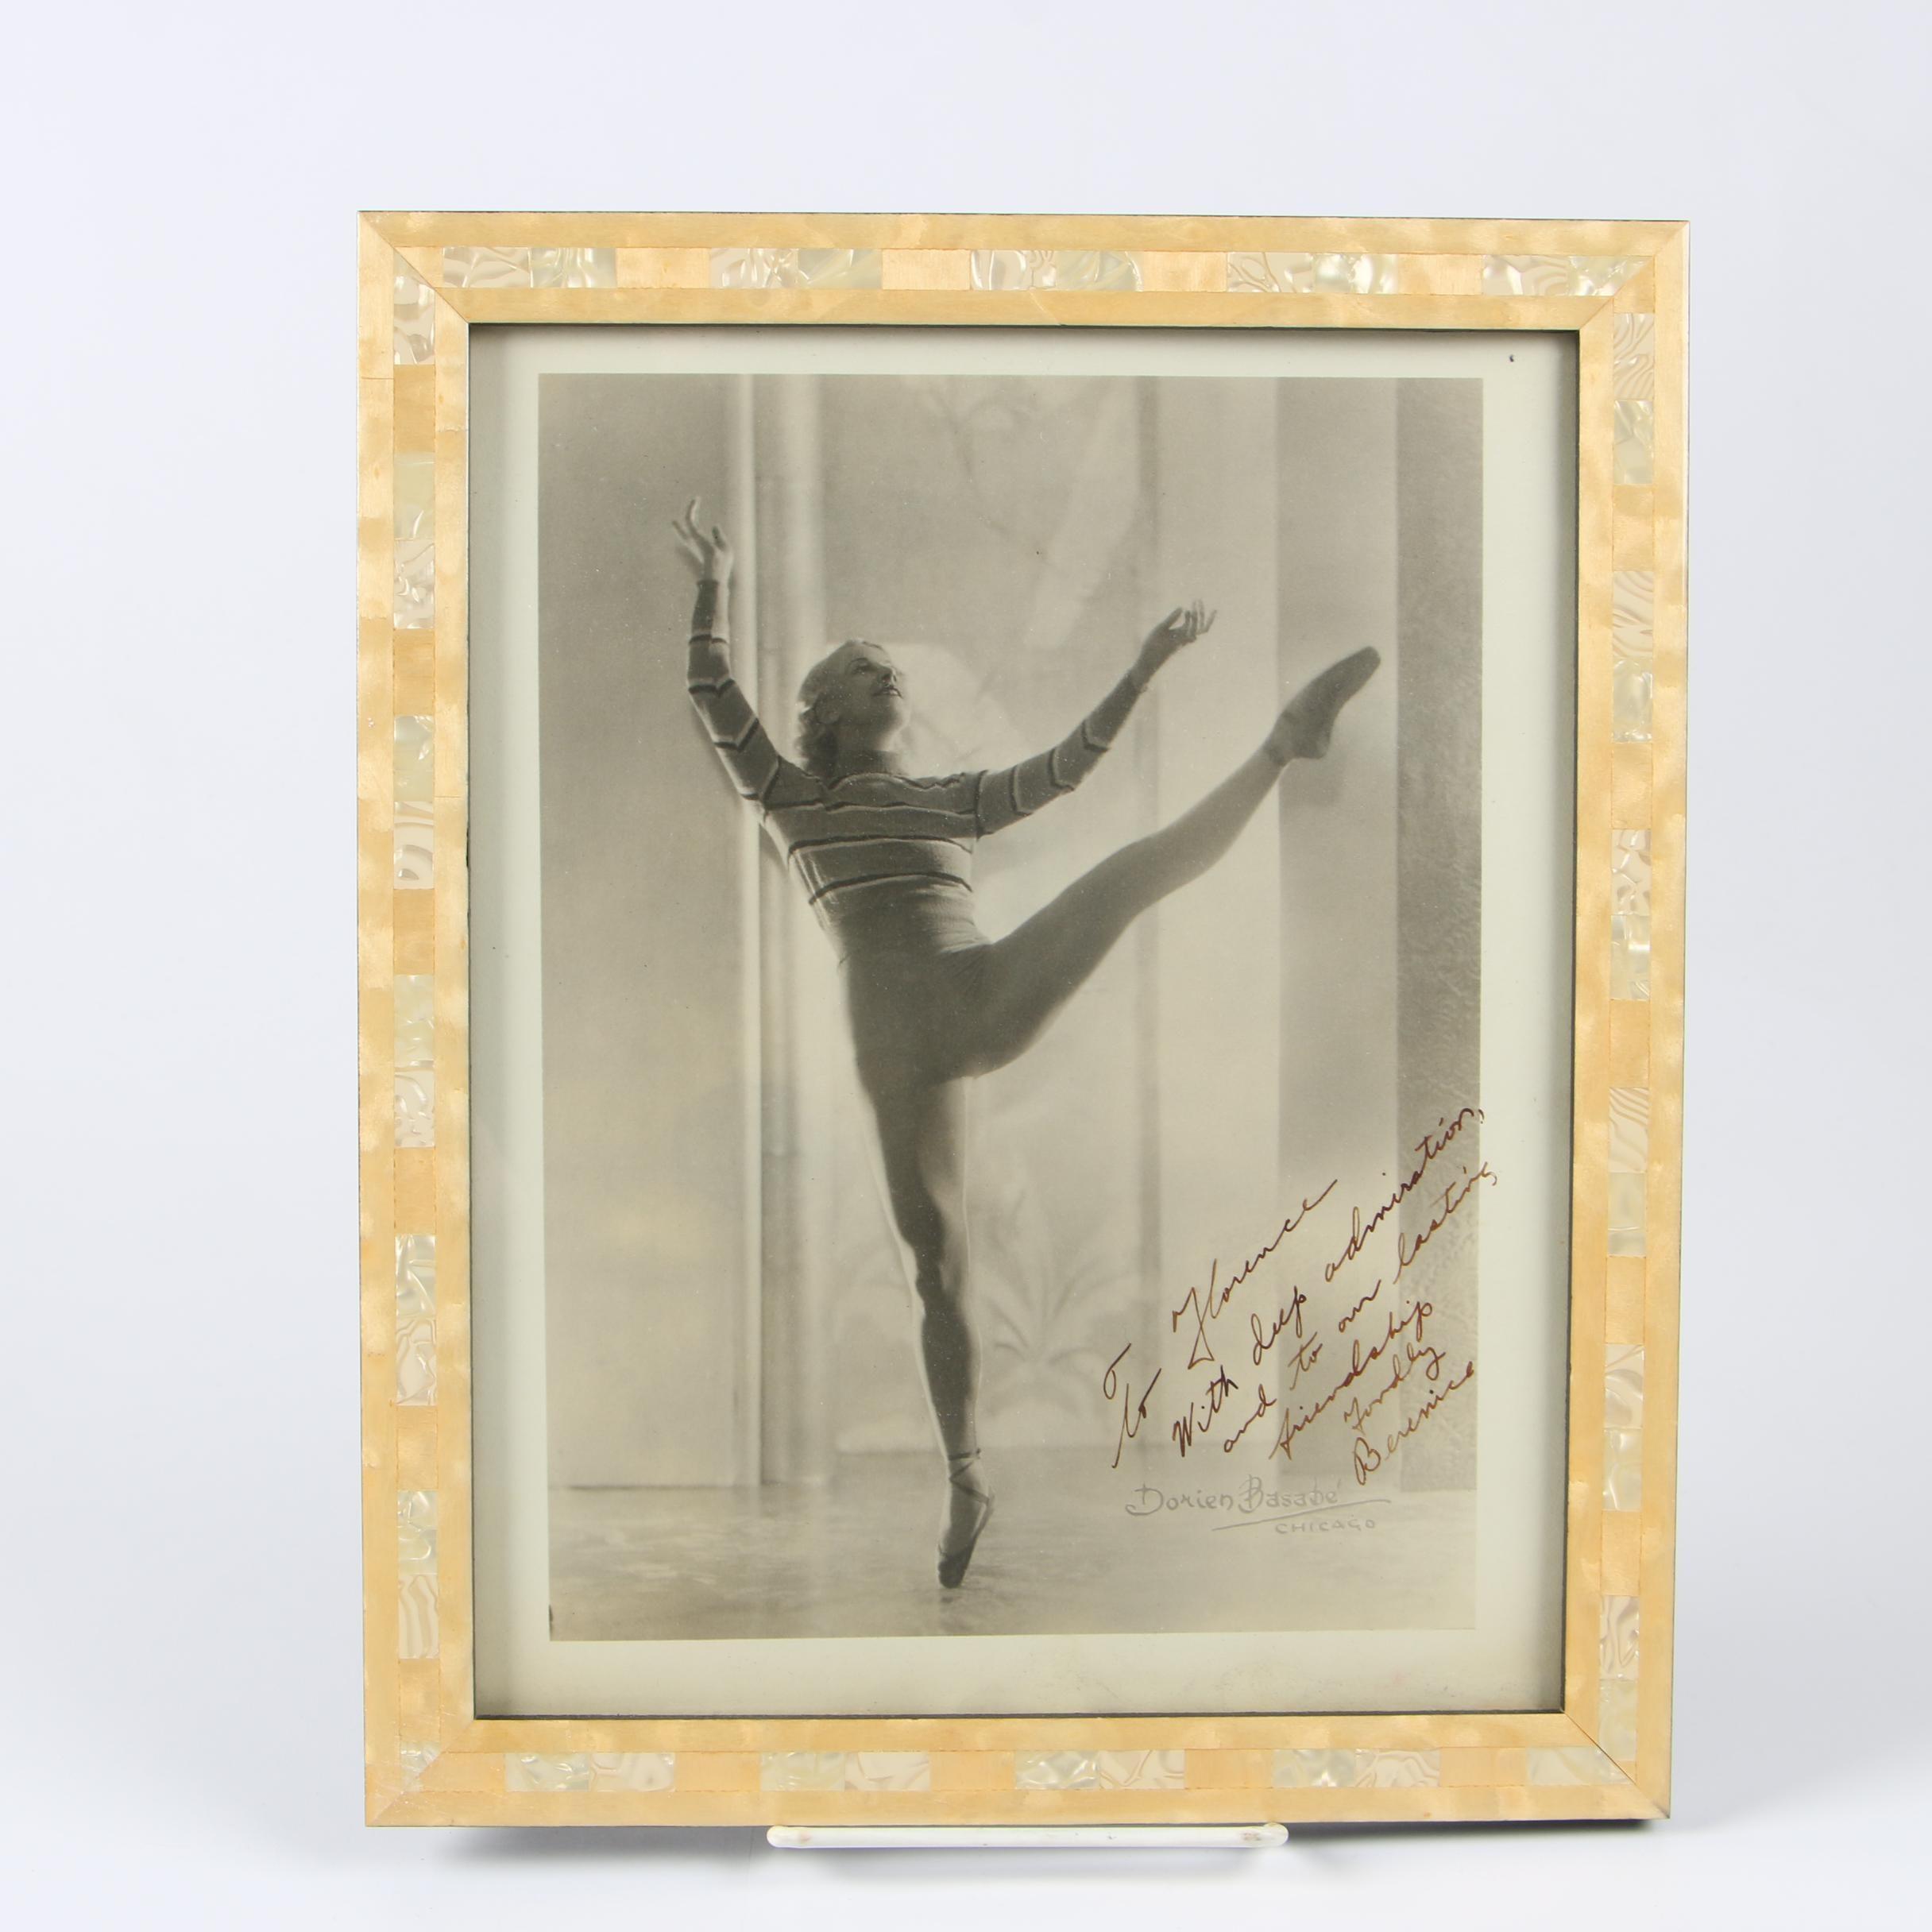 Dorien Basbabé Photograph of Ballet Dancer in Inlaid Frame